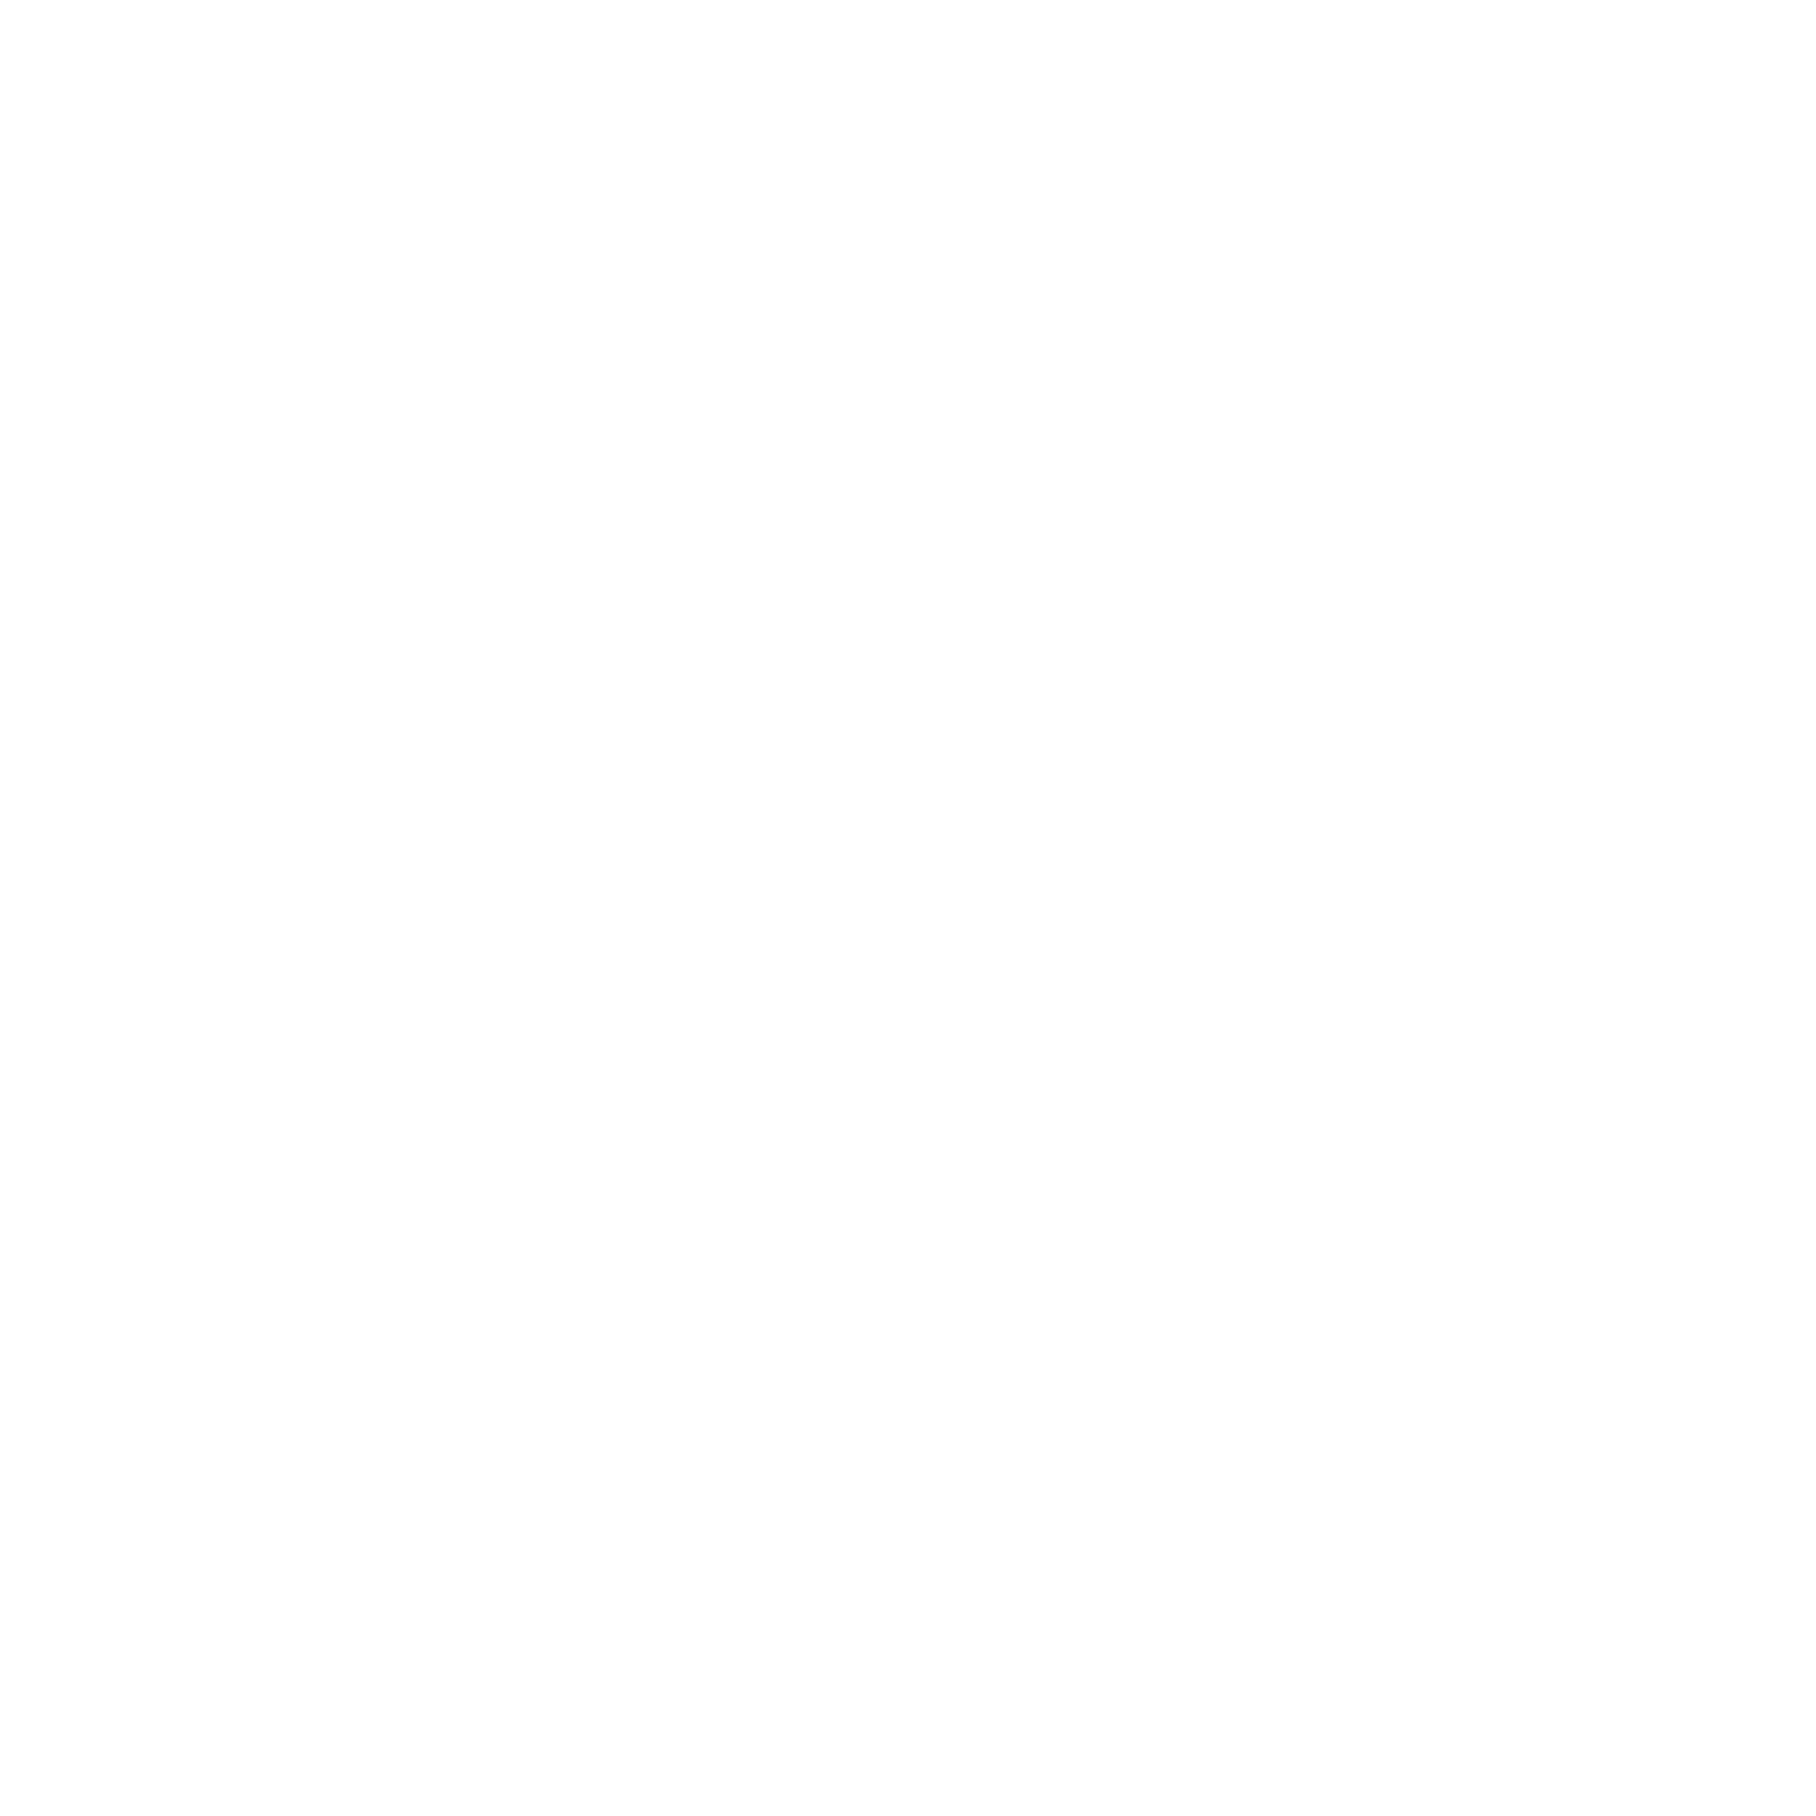 The Toledo Ticket Company